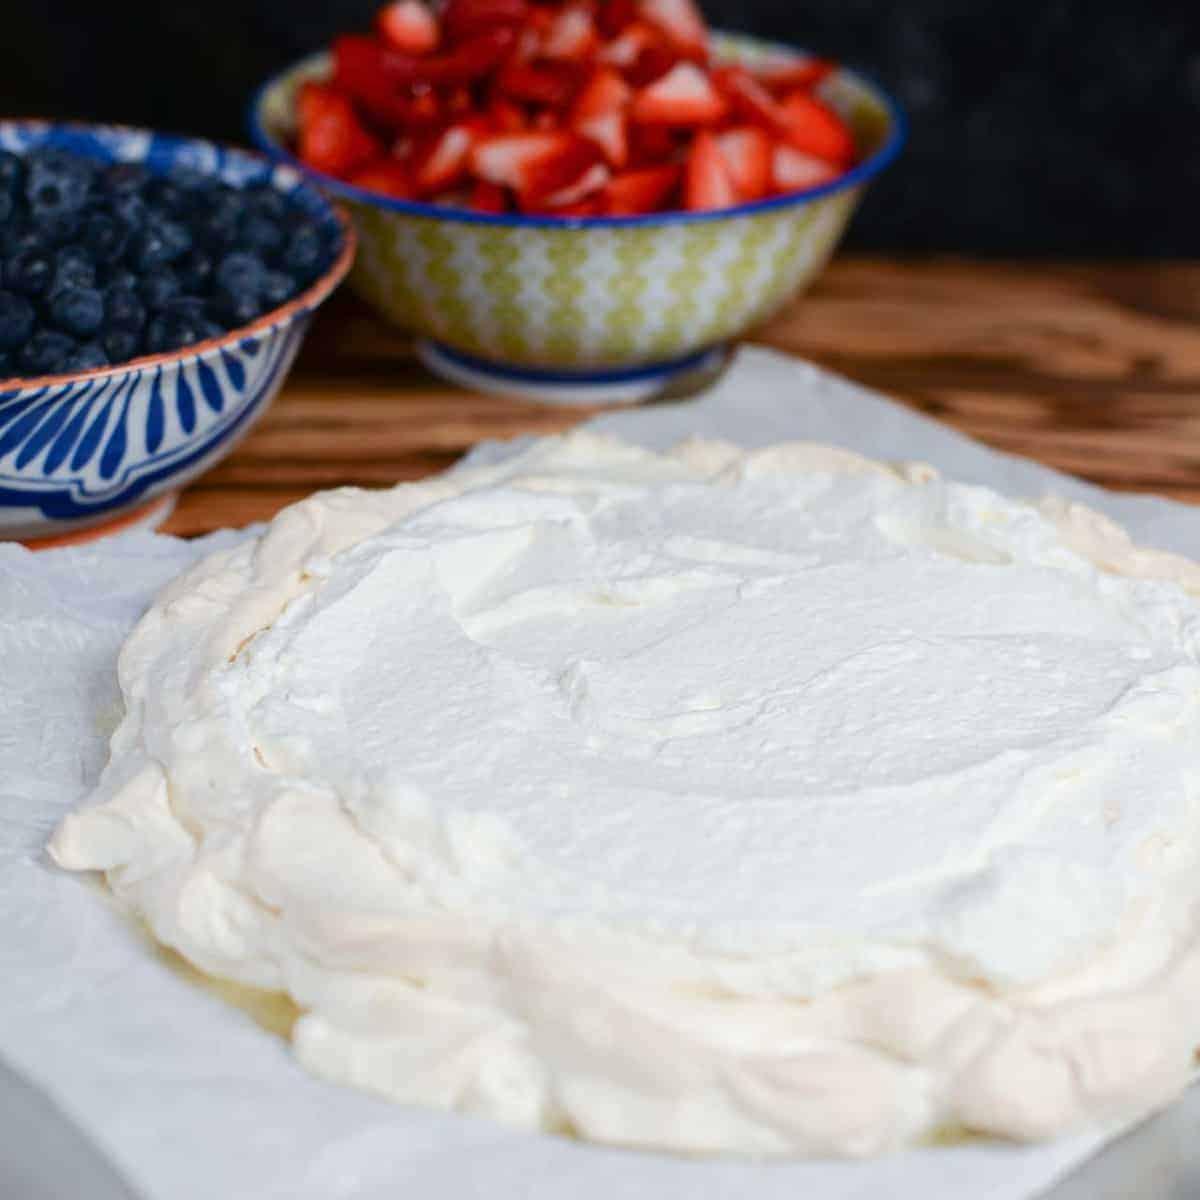 pavlova layered with whipped cream